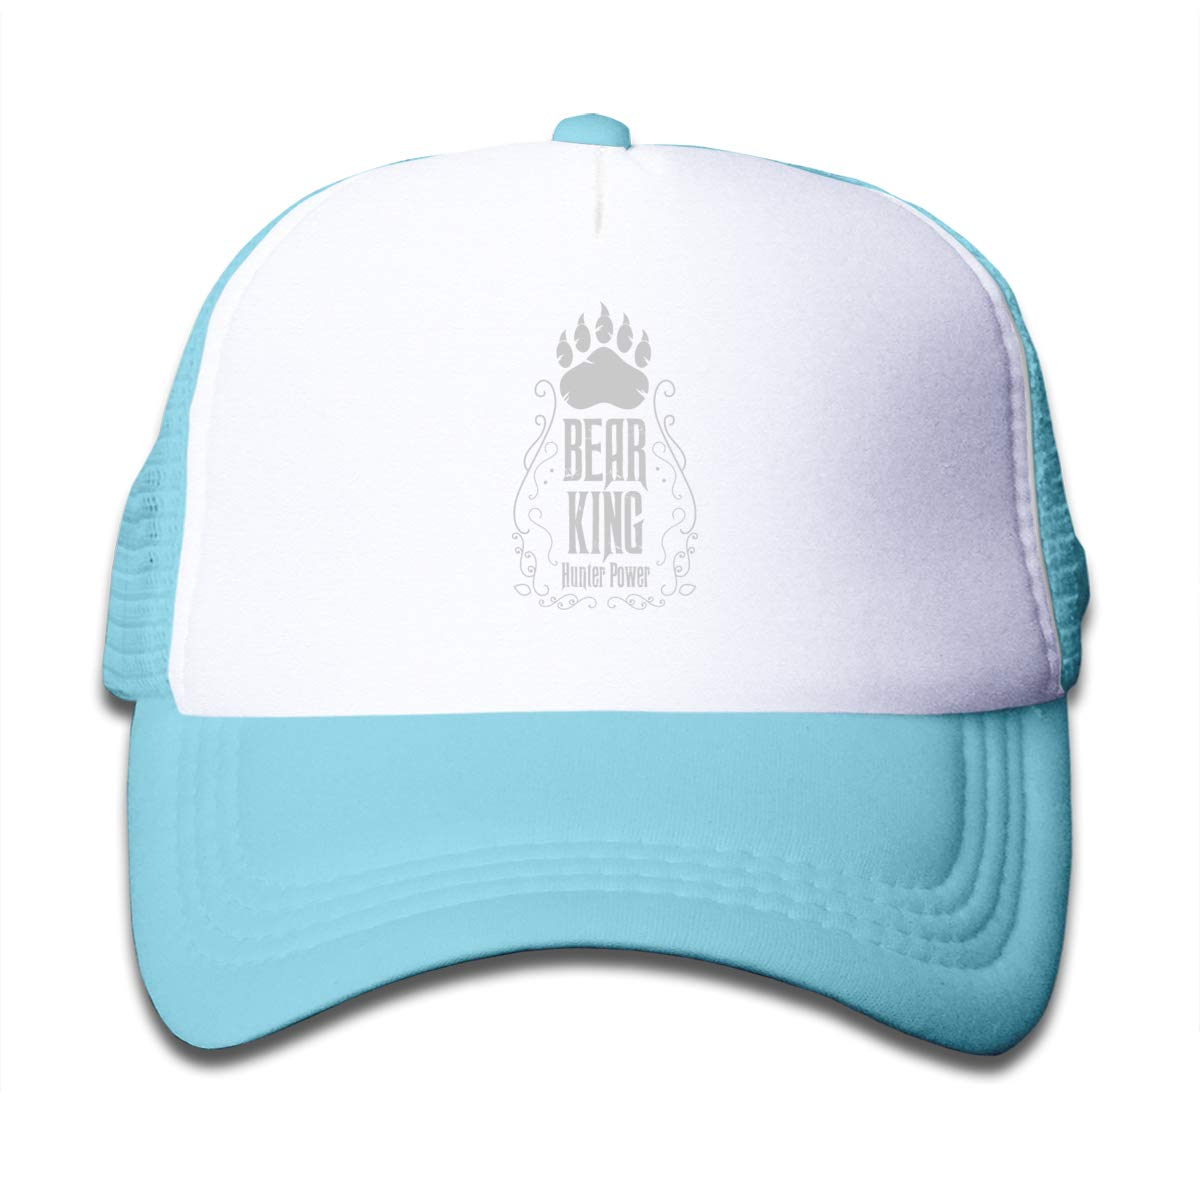 437dceefeaa65d Amazon.com: Bear King Hunter Power Mesh Baseball Caps Boy Adjustable  Trucker Hat Sky Blue: Clothing